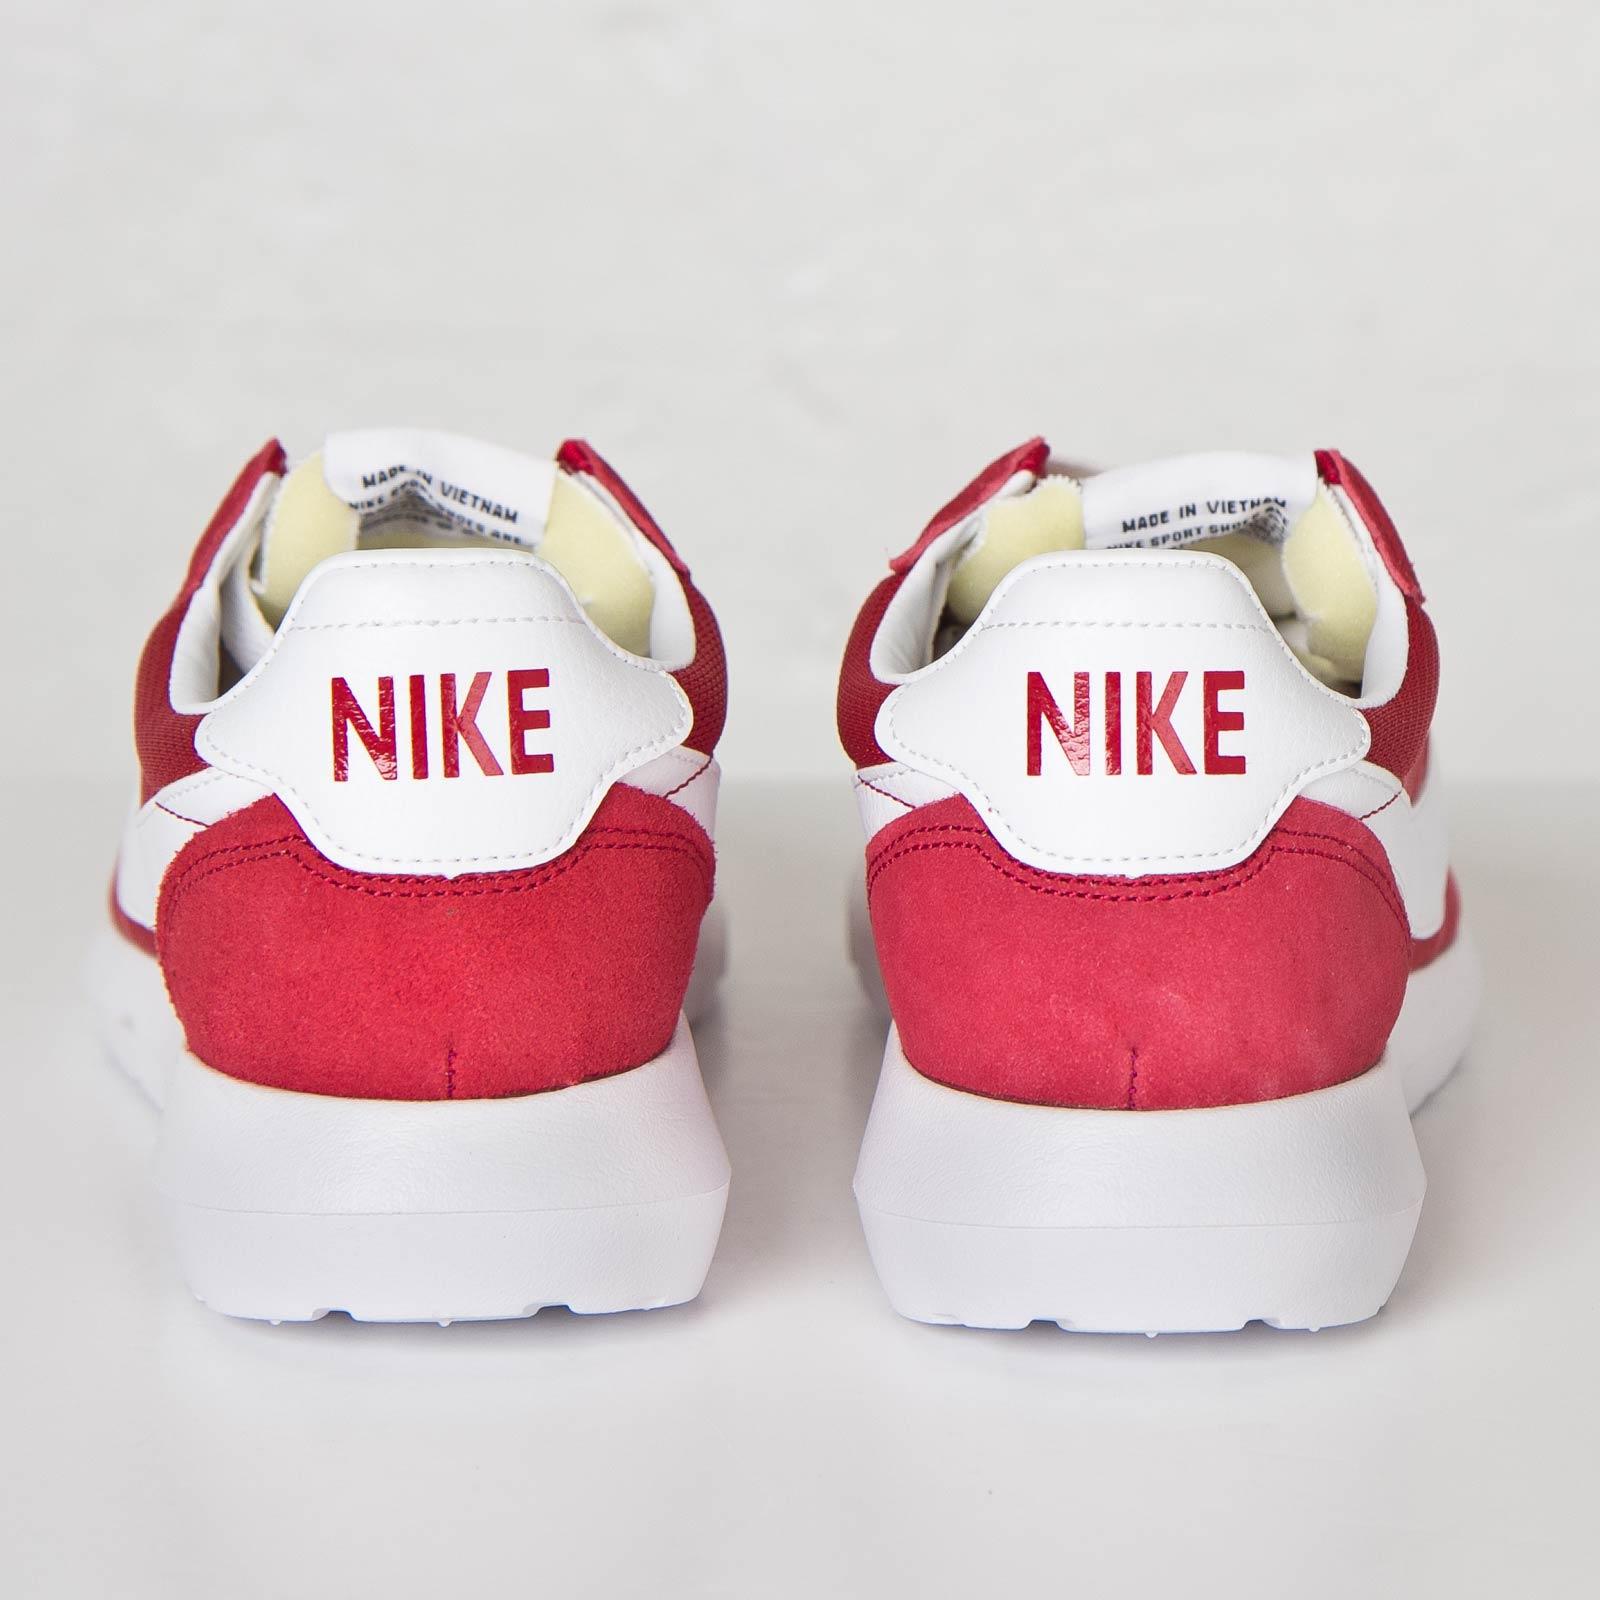 best service 93816 56fb8 Nike Roshe LD-1000 QS - 802022-601 - Sneakersnstuff   sneakers   streetwear  online since 1999